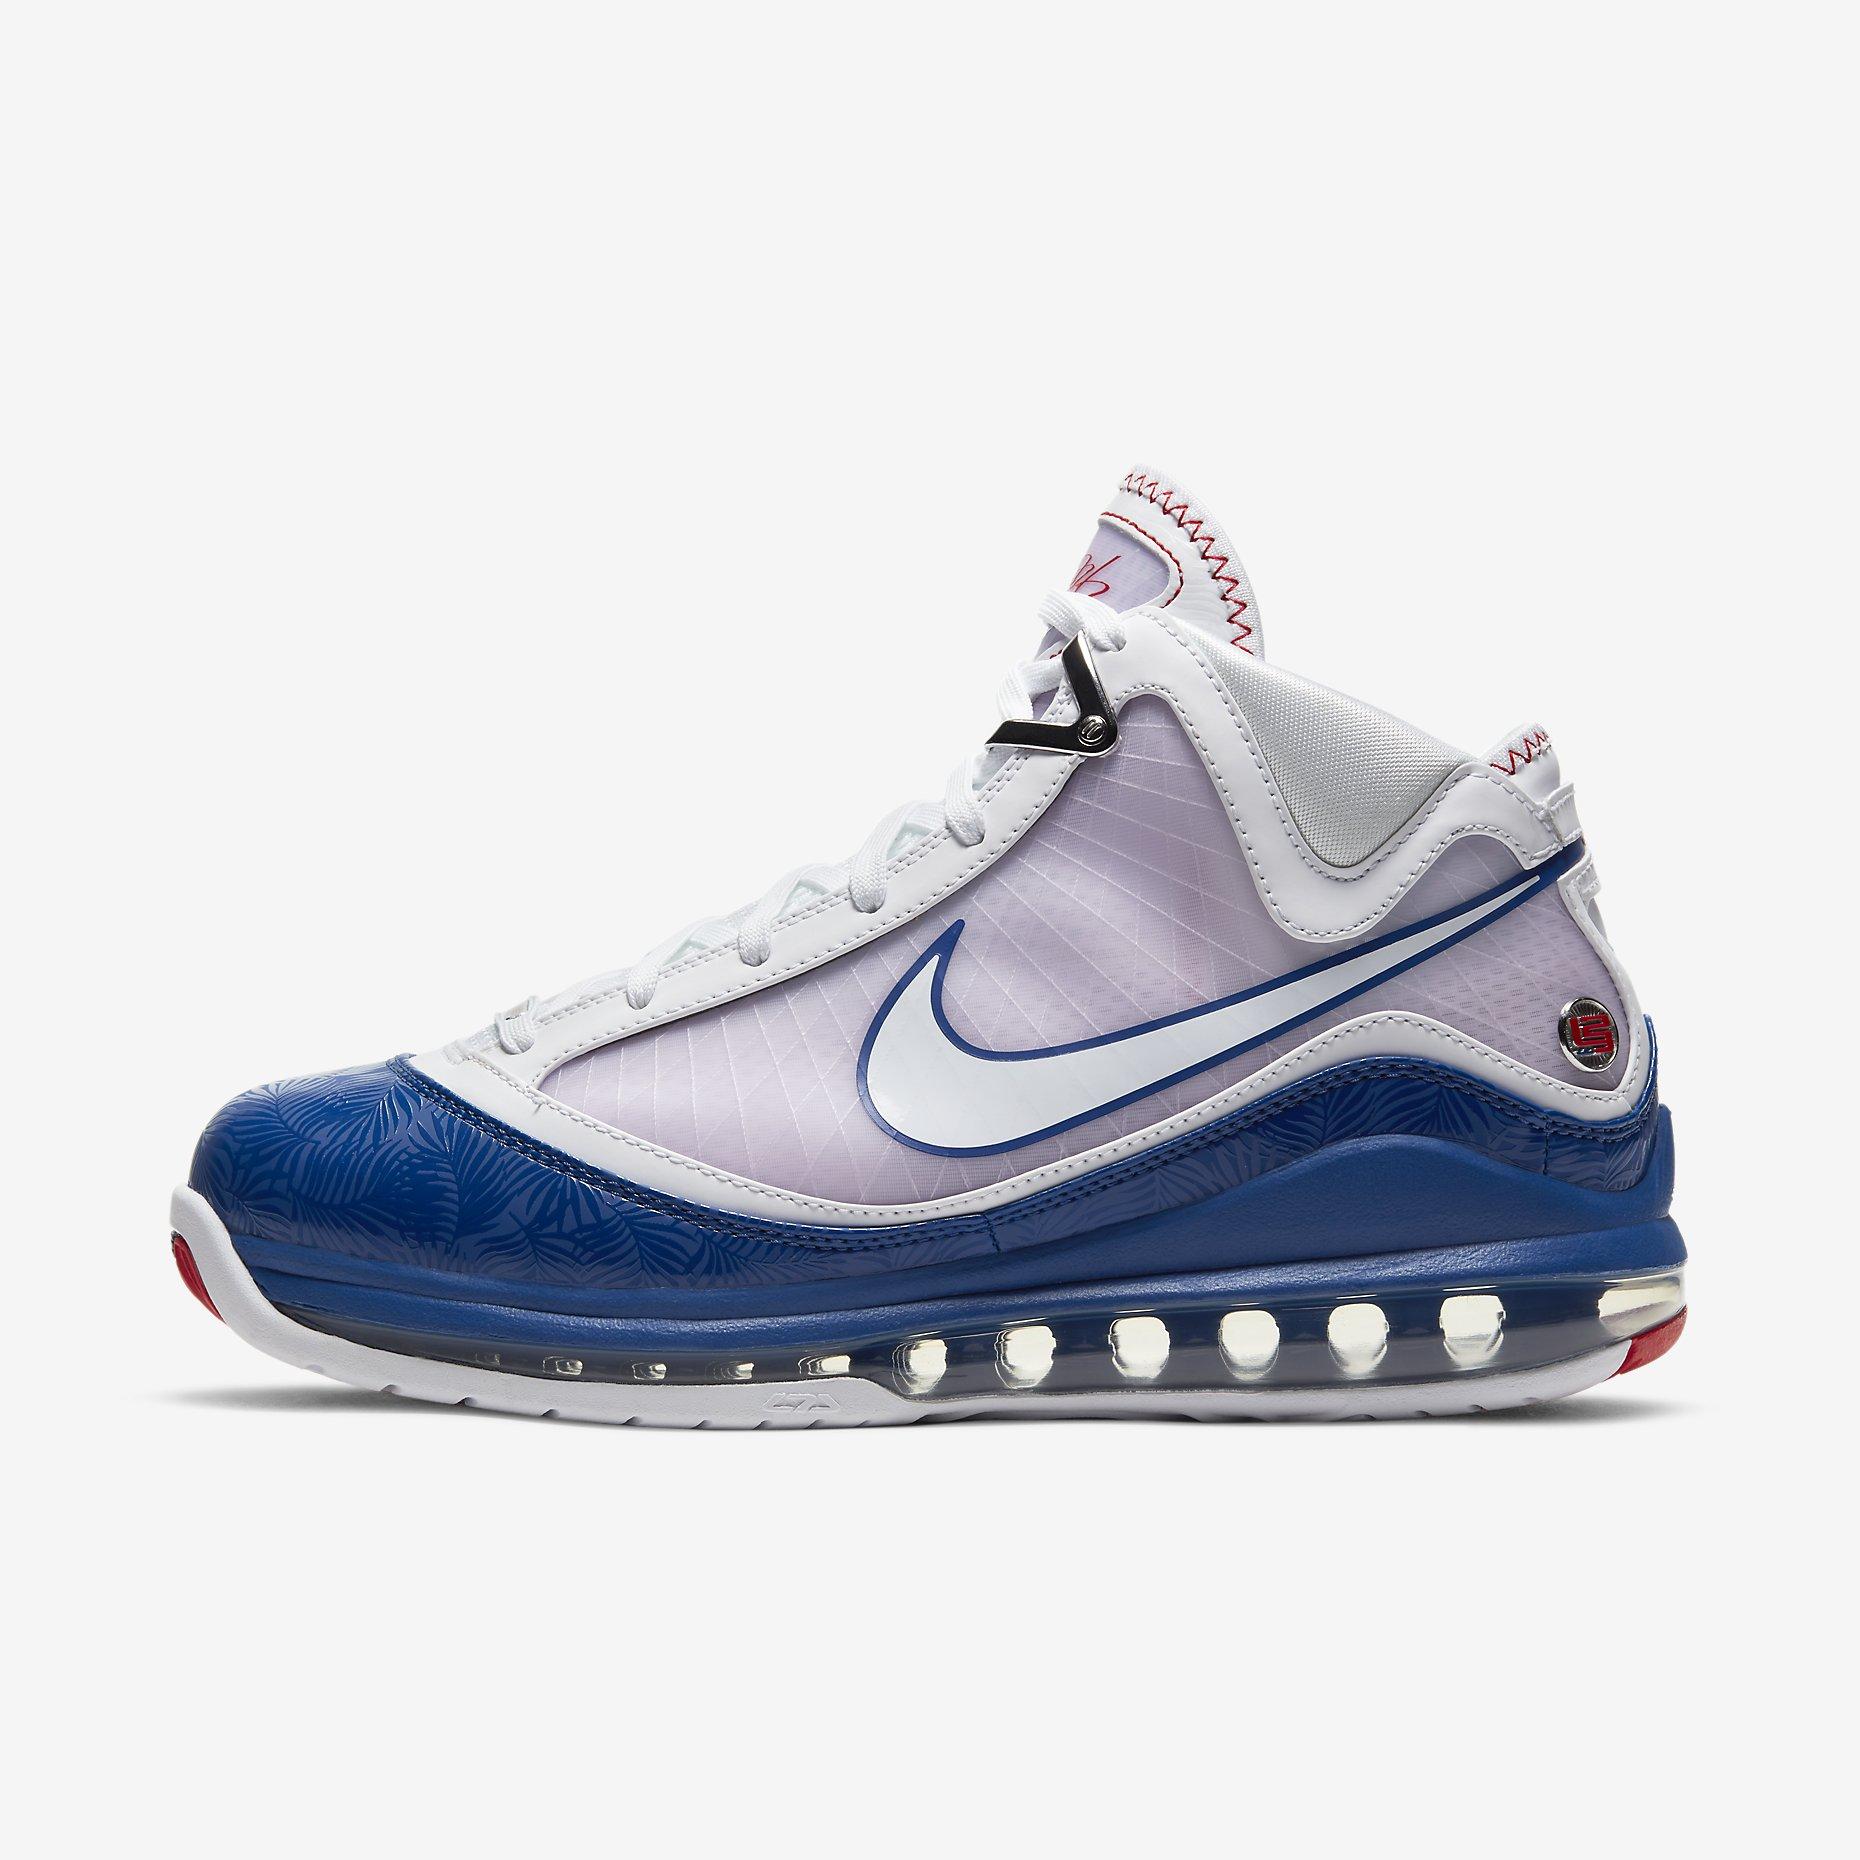 Nike LeBron 7 'Baseball Blue'}